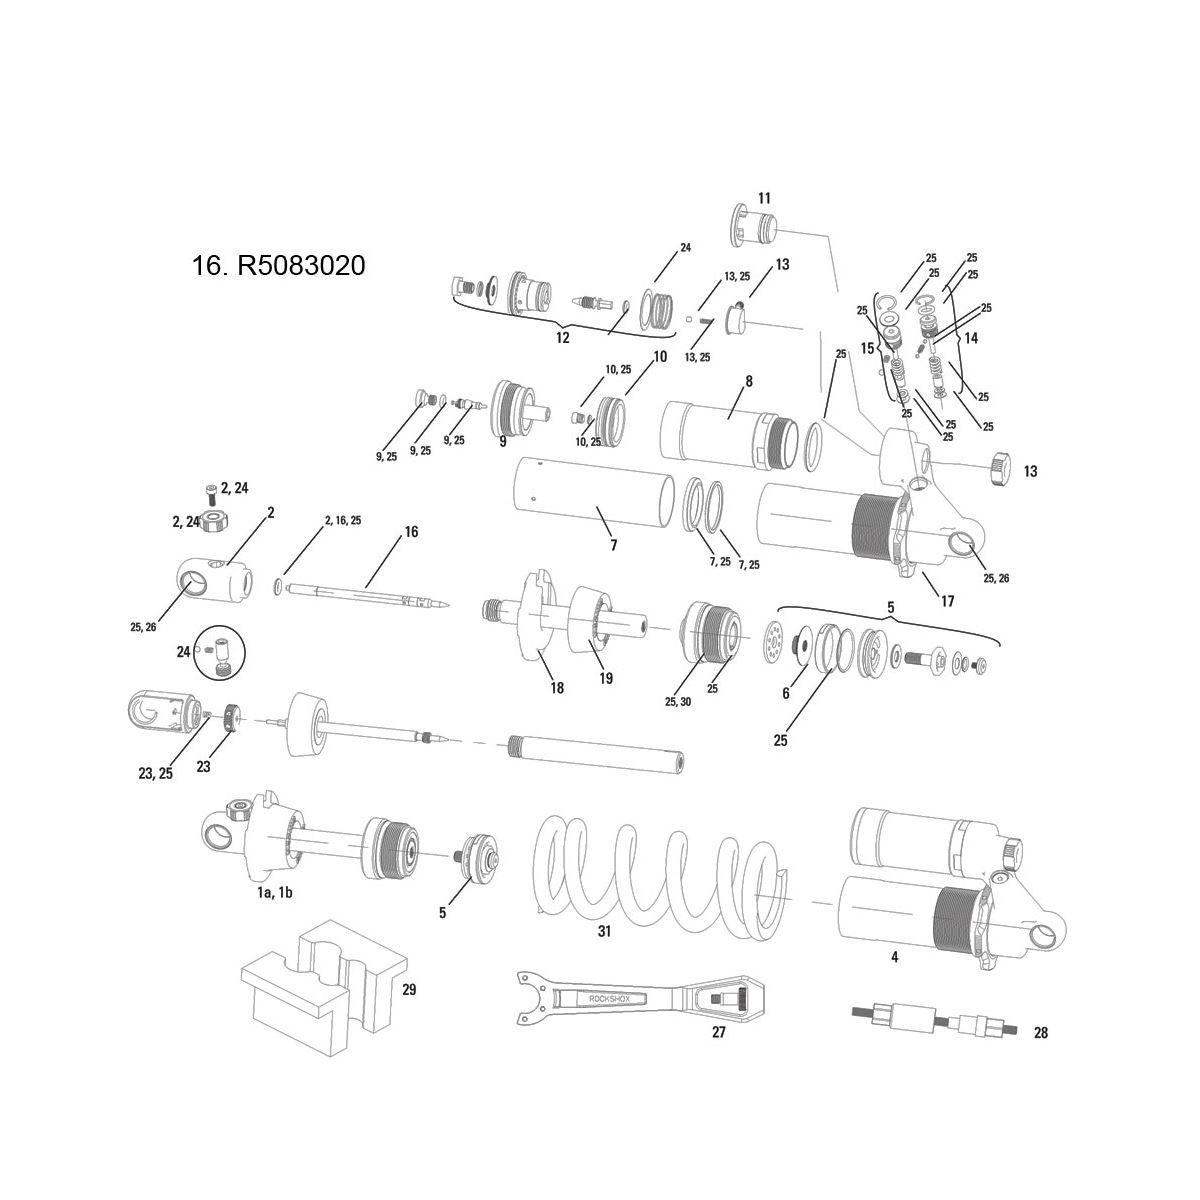 Rockshox Hot Rod Adjuster Needle/O-Ring Vivid/Vivid Air 2011 216X60/216X63Mm: